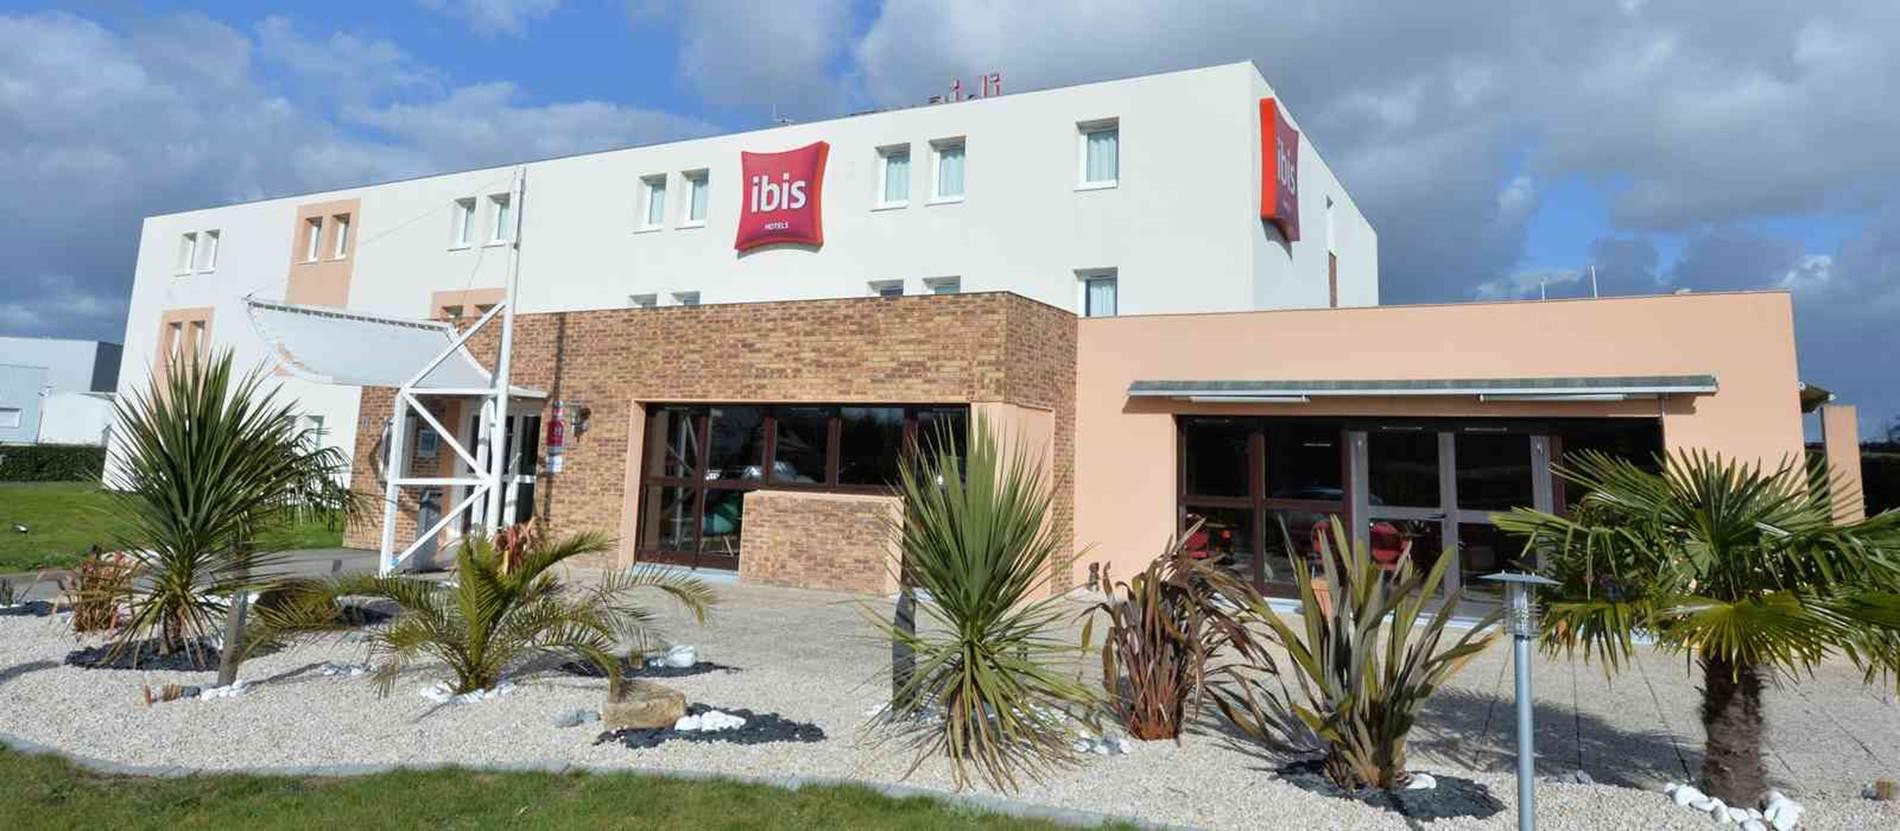 hotel-ibis-auray-extérieur © hotel-ibis-auray